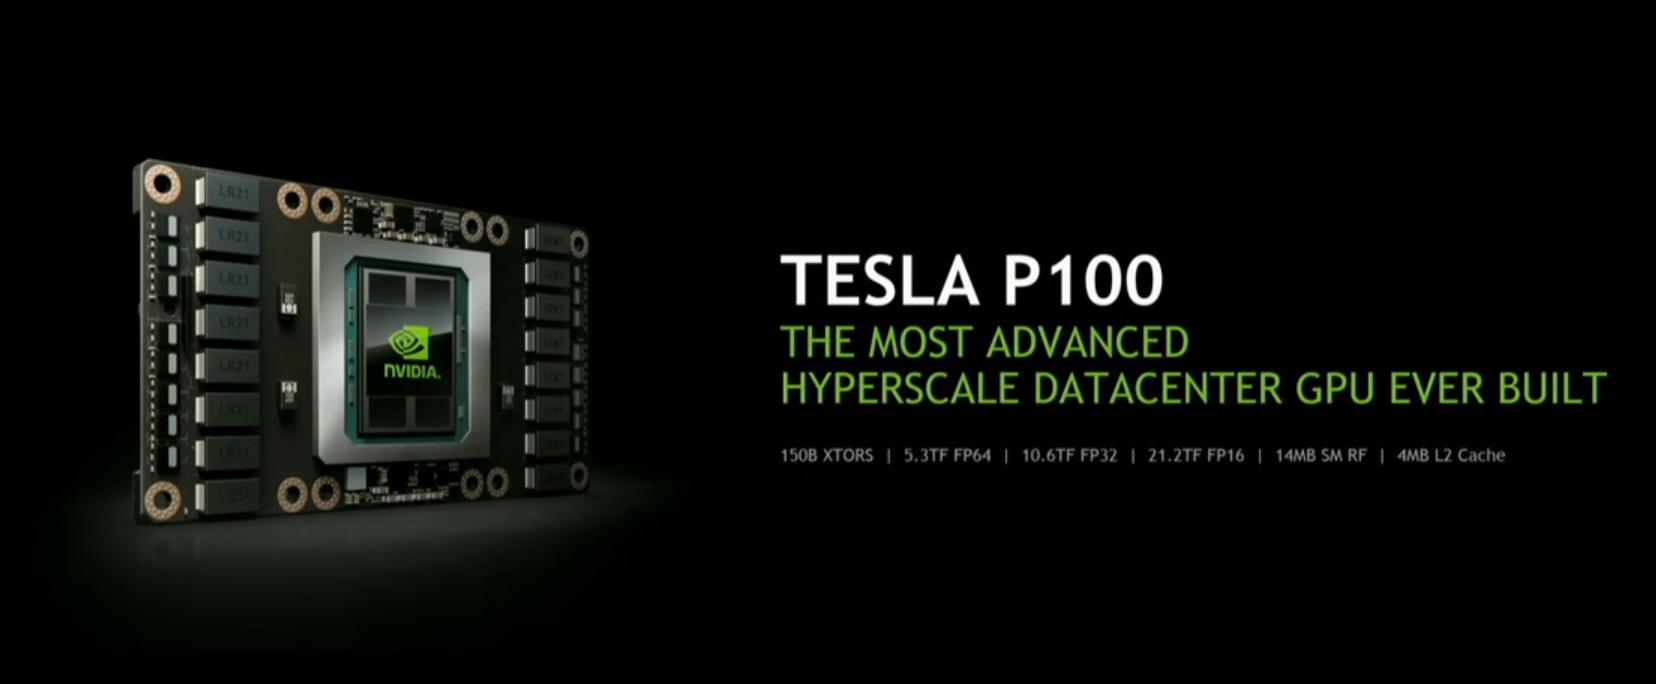 Nvidia Tesla P100 accelerator